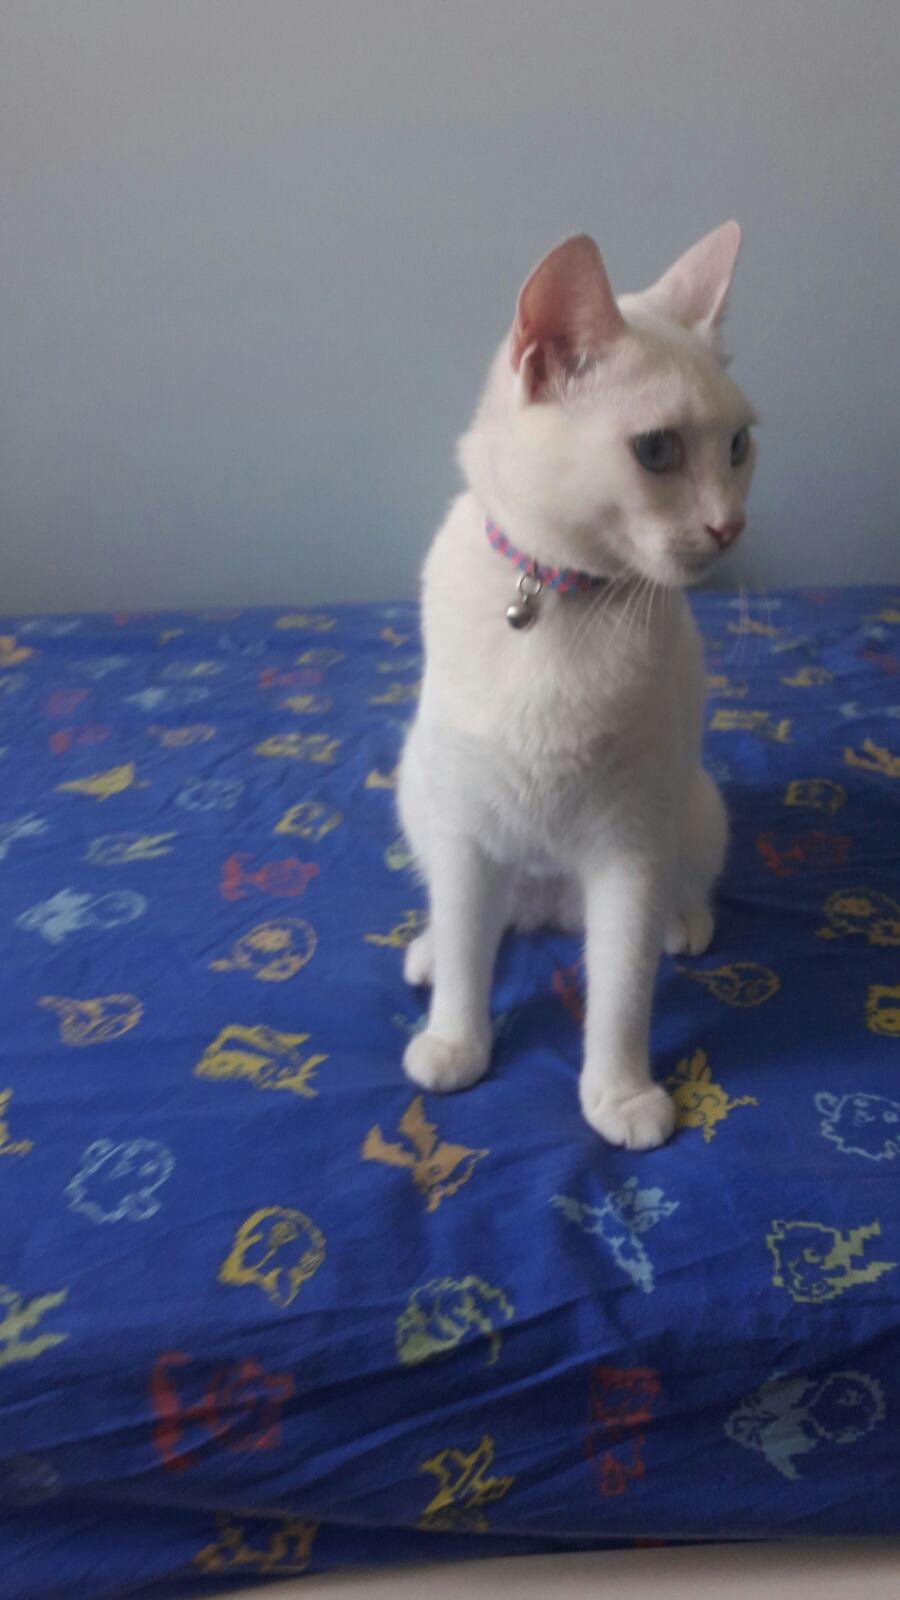 8 aylık dişi ankara kedisi